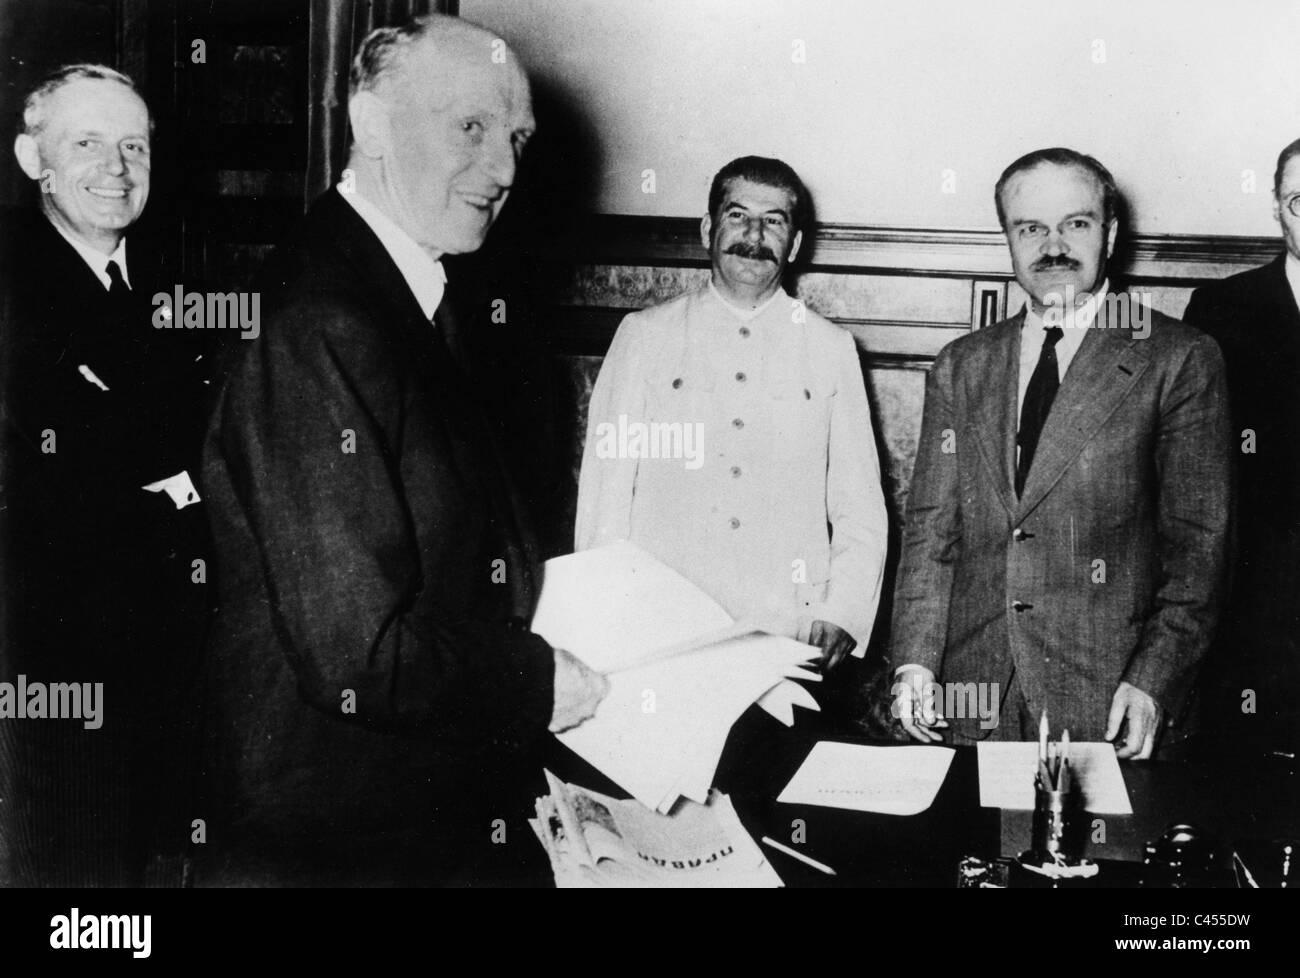 Ribbentrop, Gaus, Stalin, Molotov, Hilger at the signing of the Hitler-Stalin Pact Stock Photo